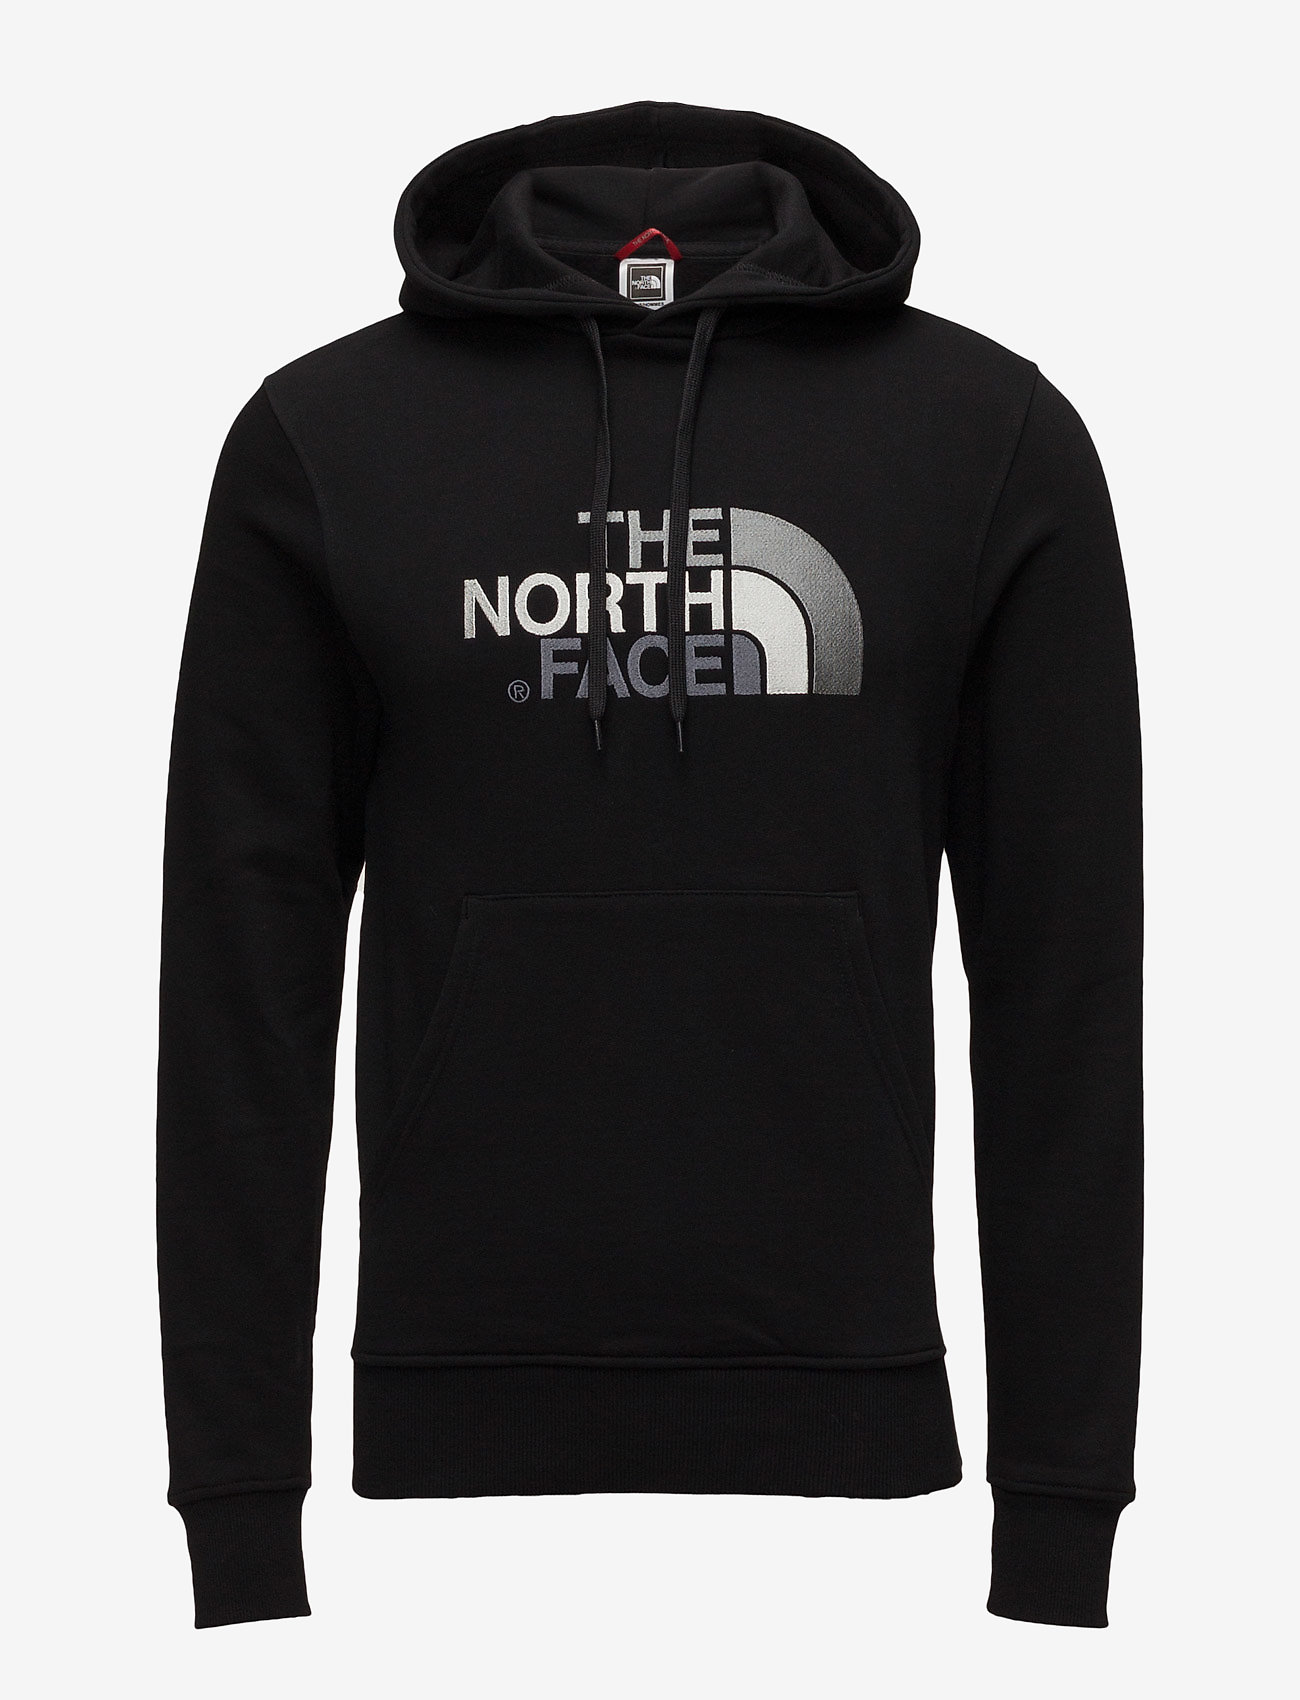 The North Face - M DREW PEAK PLV HD - džemperi ar kapuci - tnf blk/tnf blk - 0